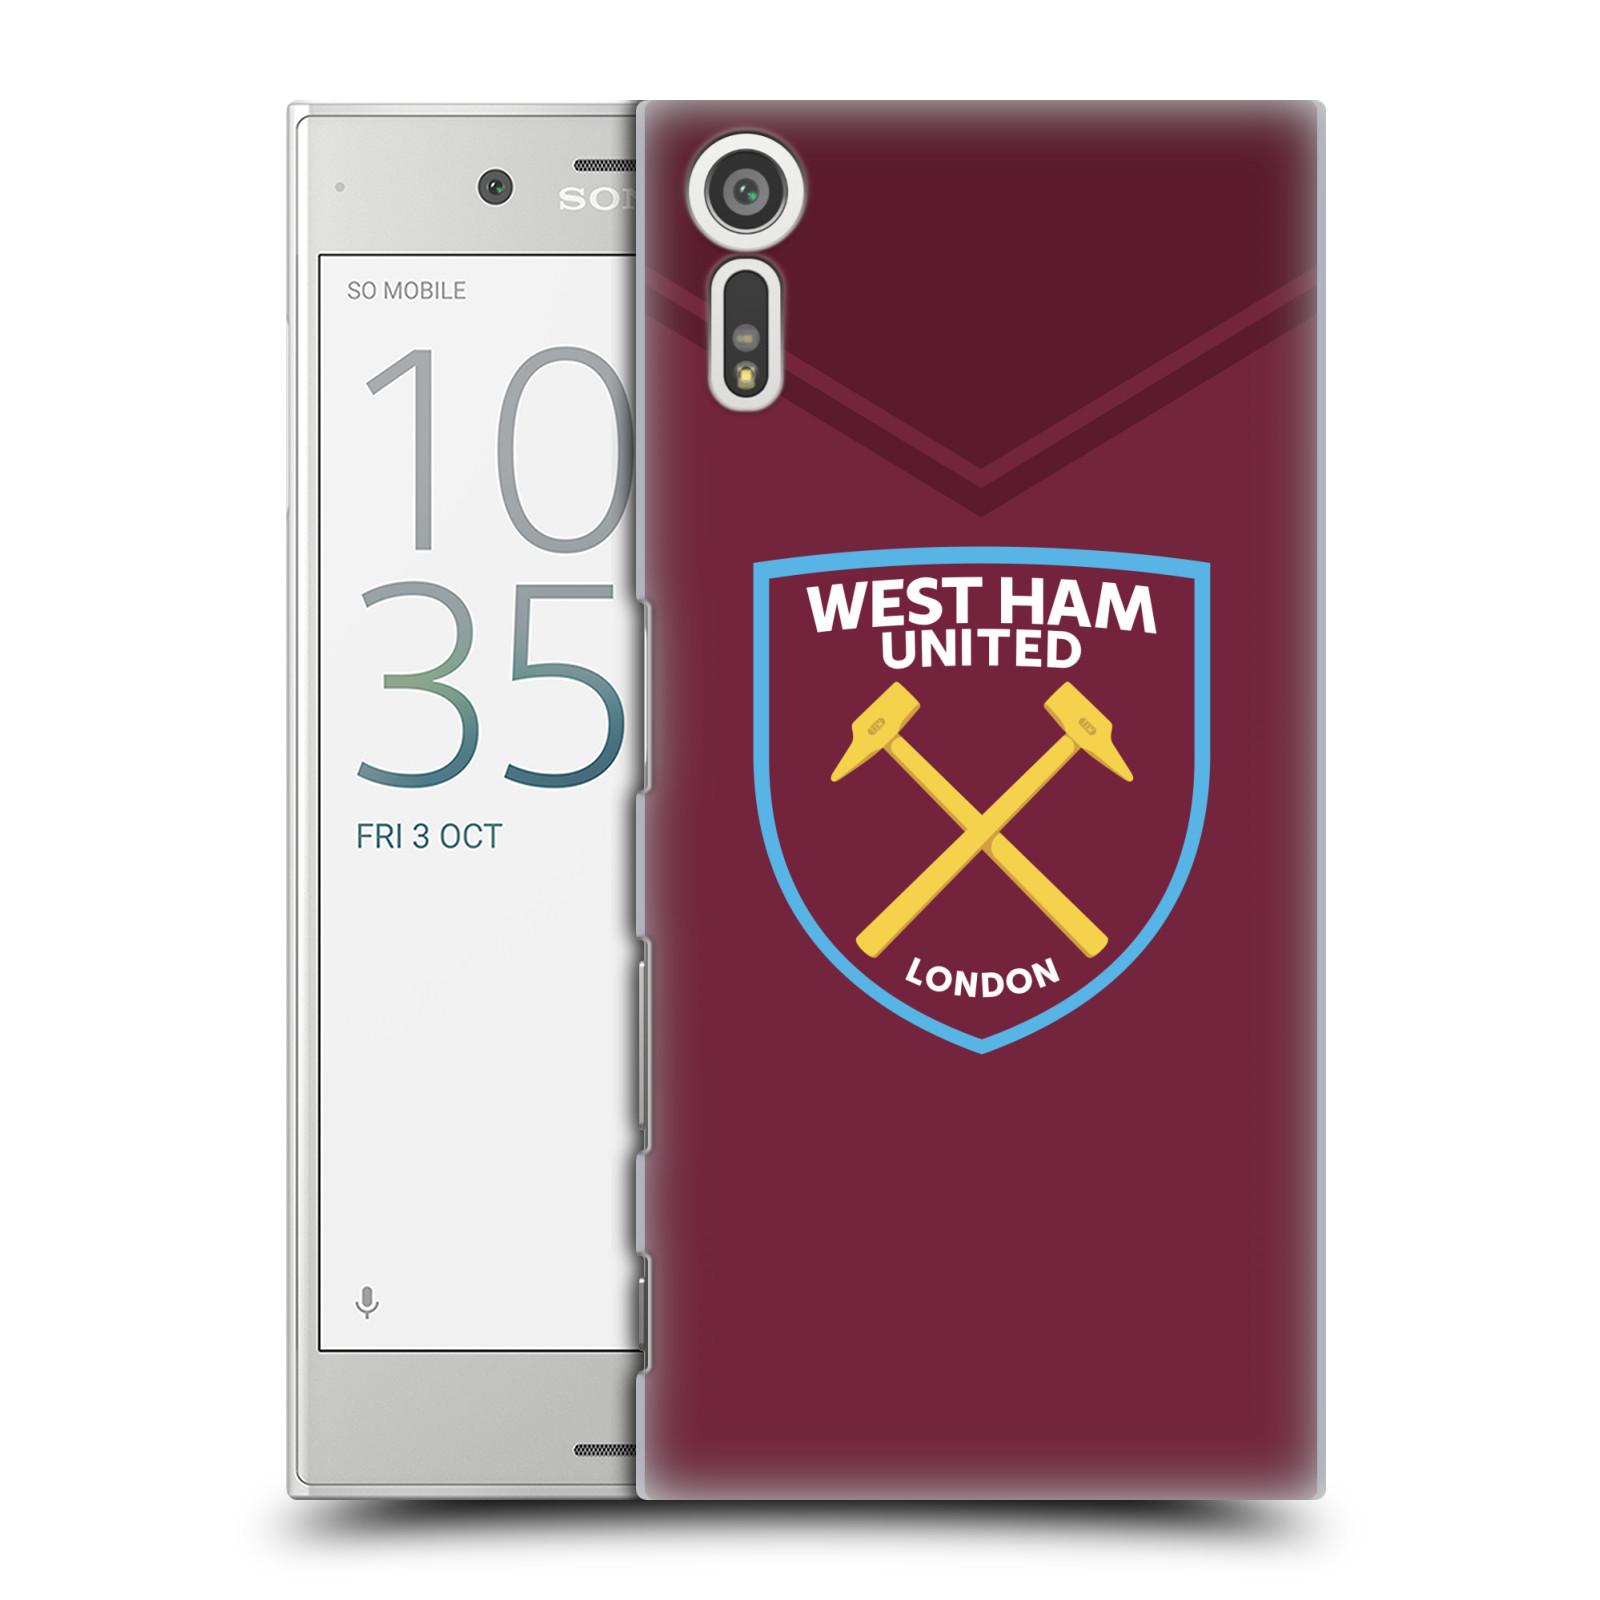 Plastové pouzdro na mobil Sony Xperia XZ - Head Case - West Ham United - Logo (Plastový kryt či obal na mobilní telefon s motivem West Ham United - Kladiváři - Logo pro Sony Xperia XZ F8331 / Sony Xperia XZ Dual F8332)